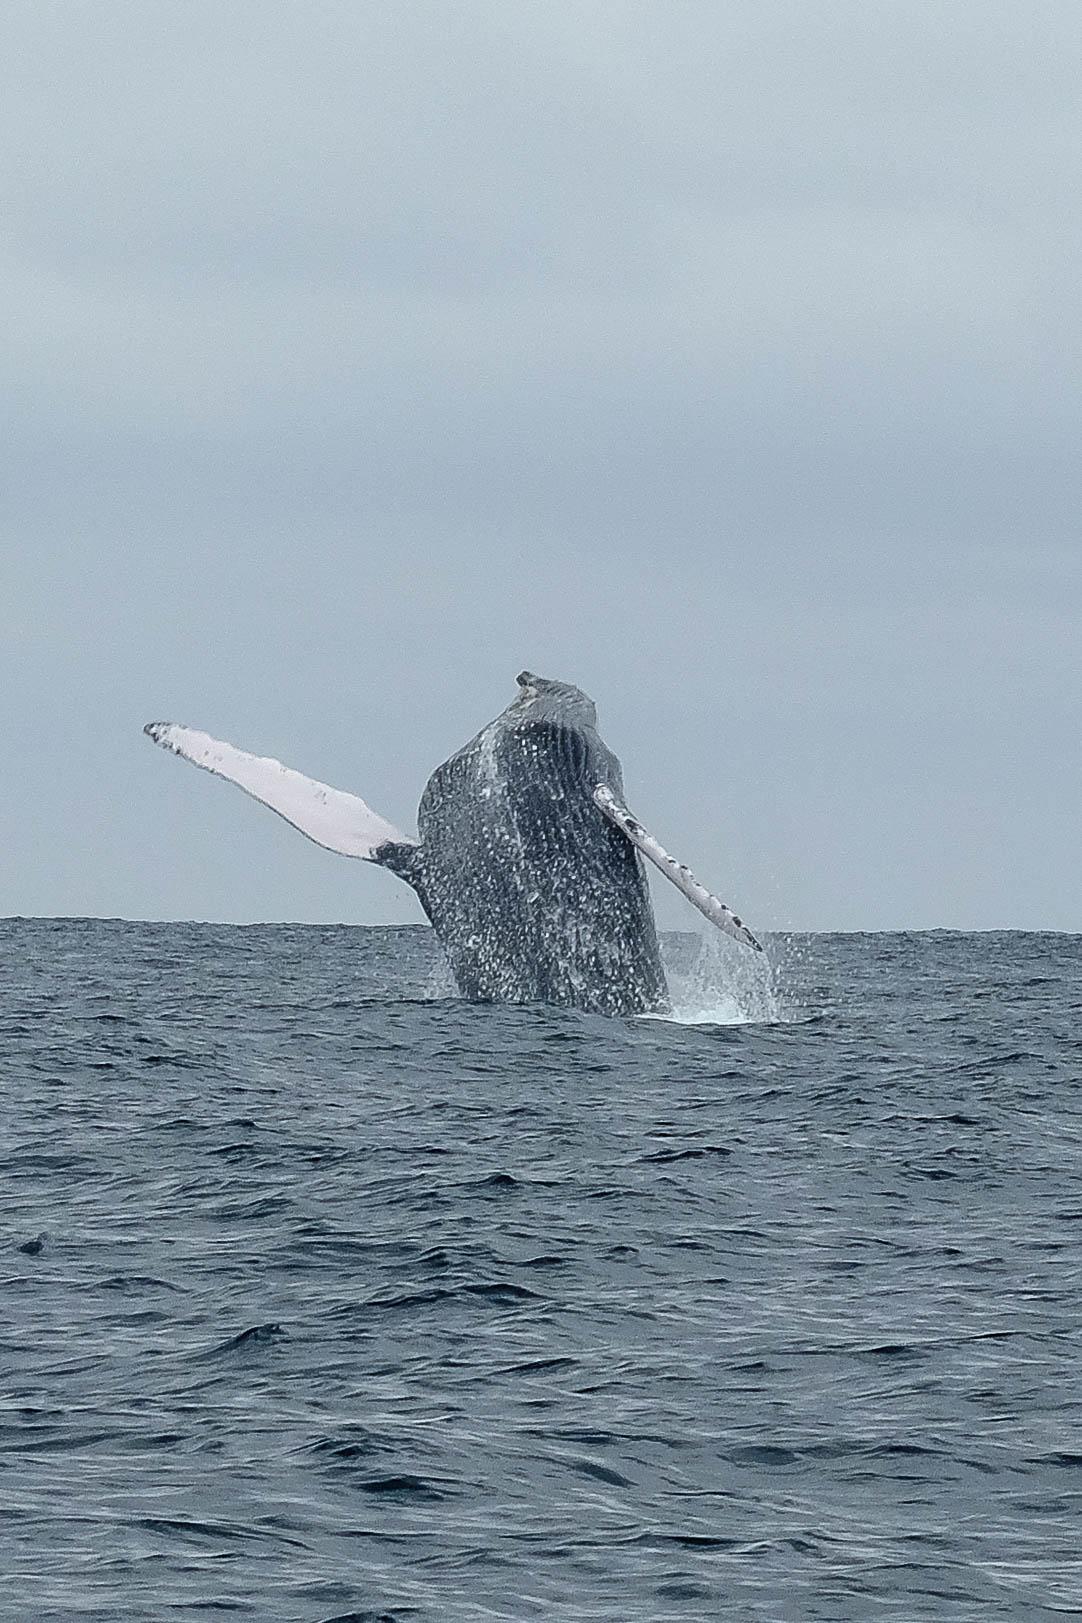 equateur-saut-baleine